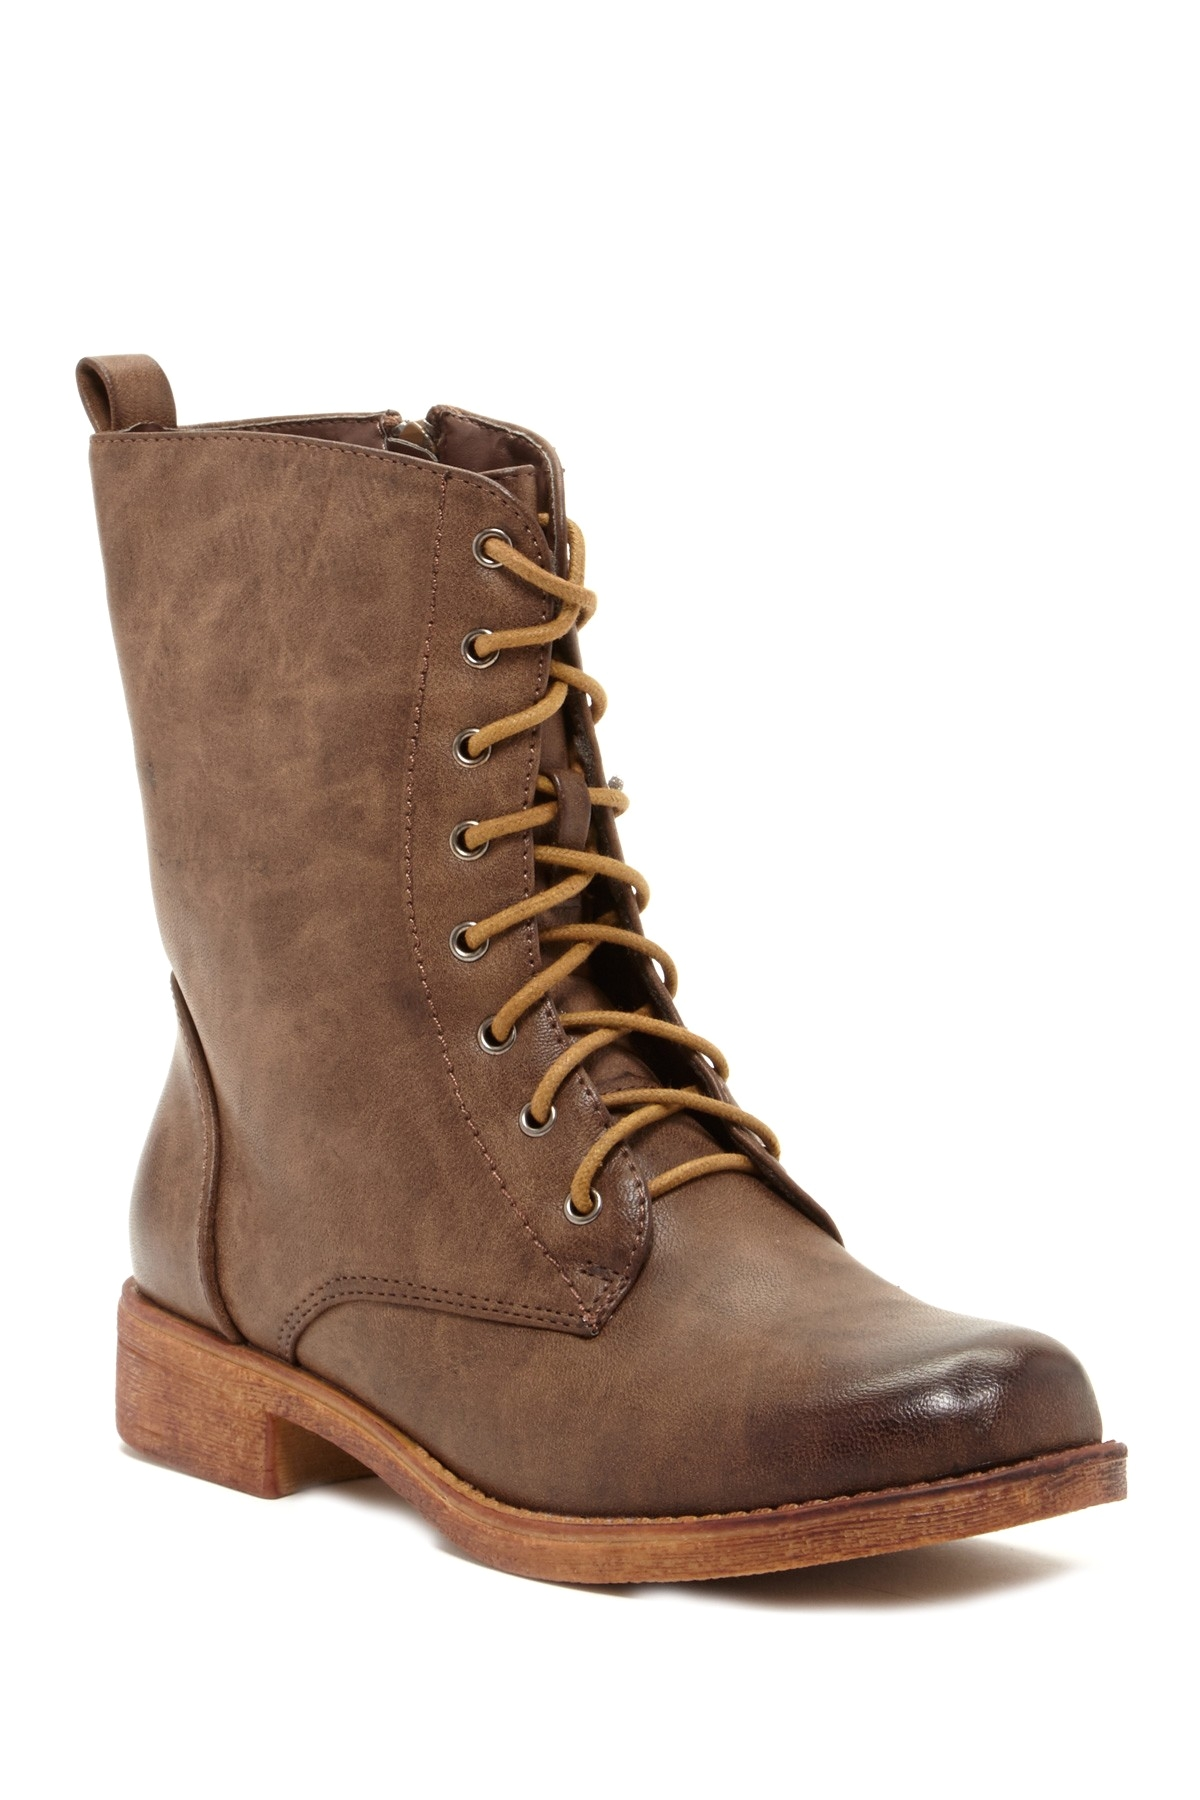 Mens Timberland Boots nordstrom Rack Bucco sonata Overlay Combat Boot nordstrom Rack